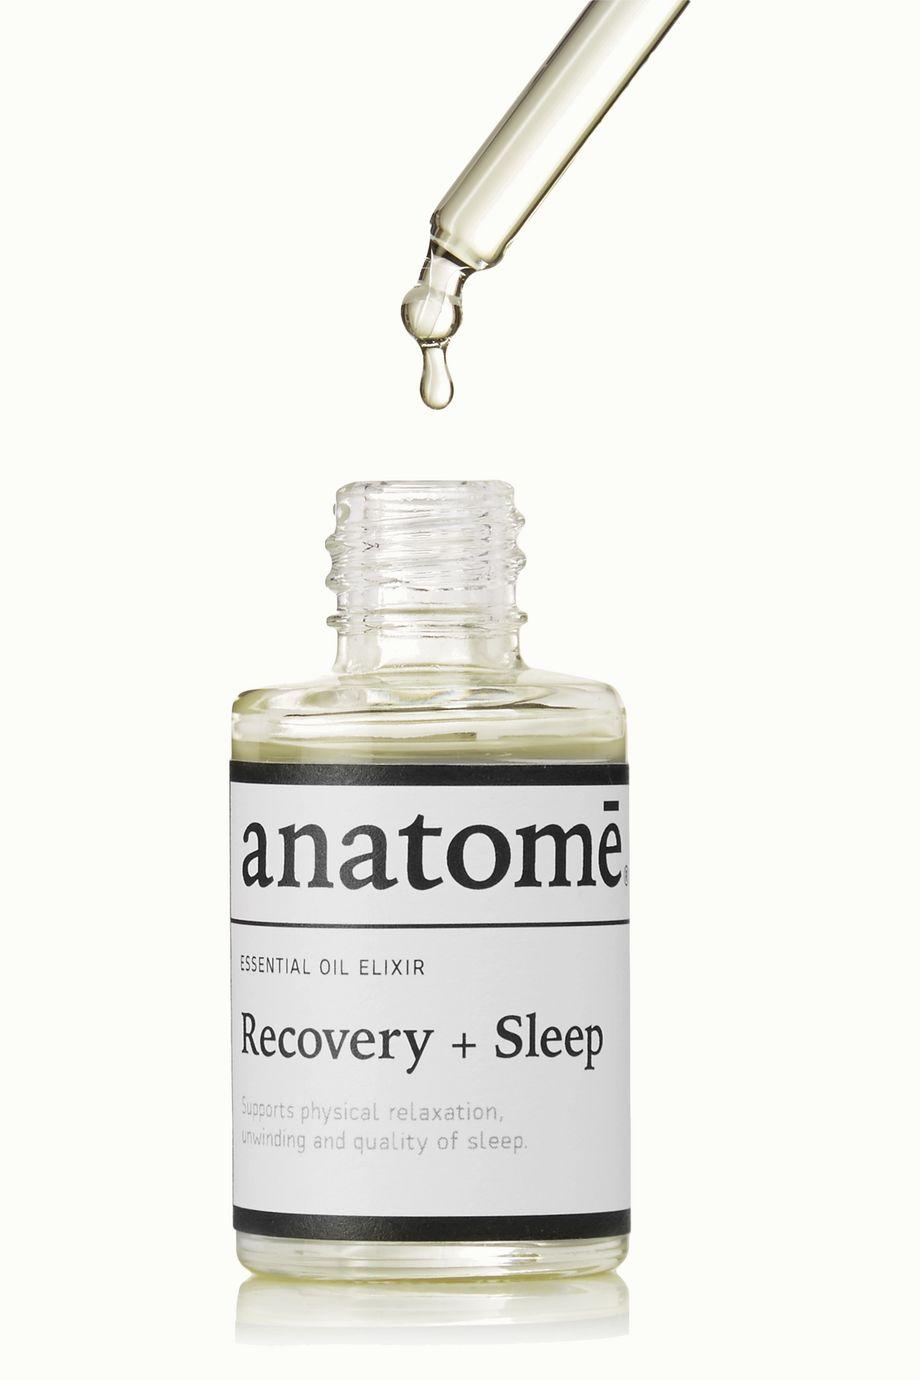 anatomē Essential Oil Elixir – Recovery + Sleep, 30 ml – Ätherisches Öl